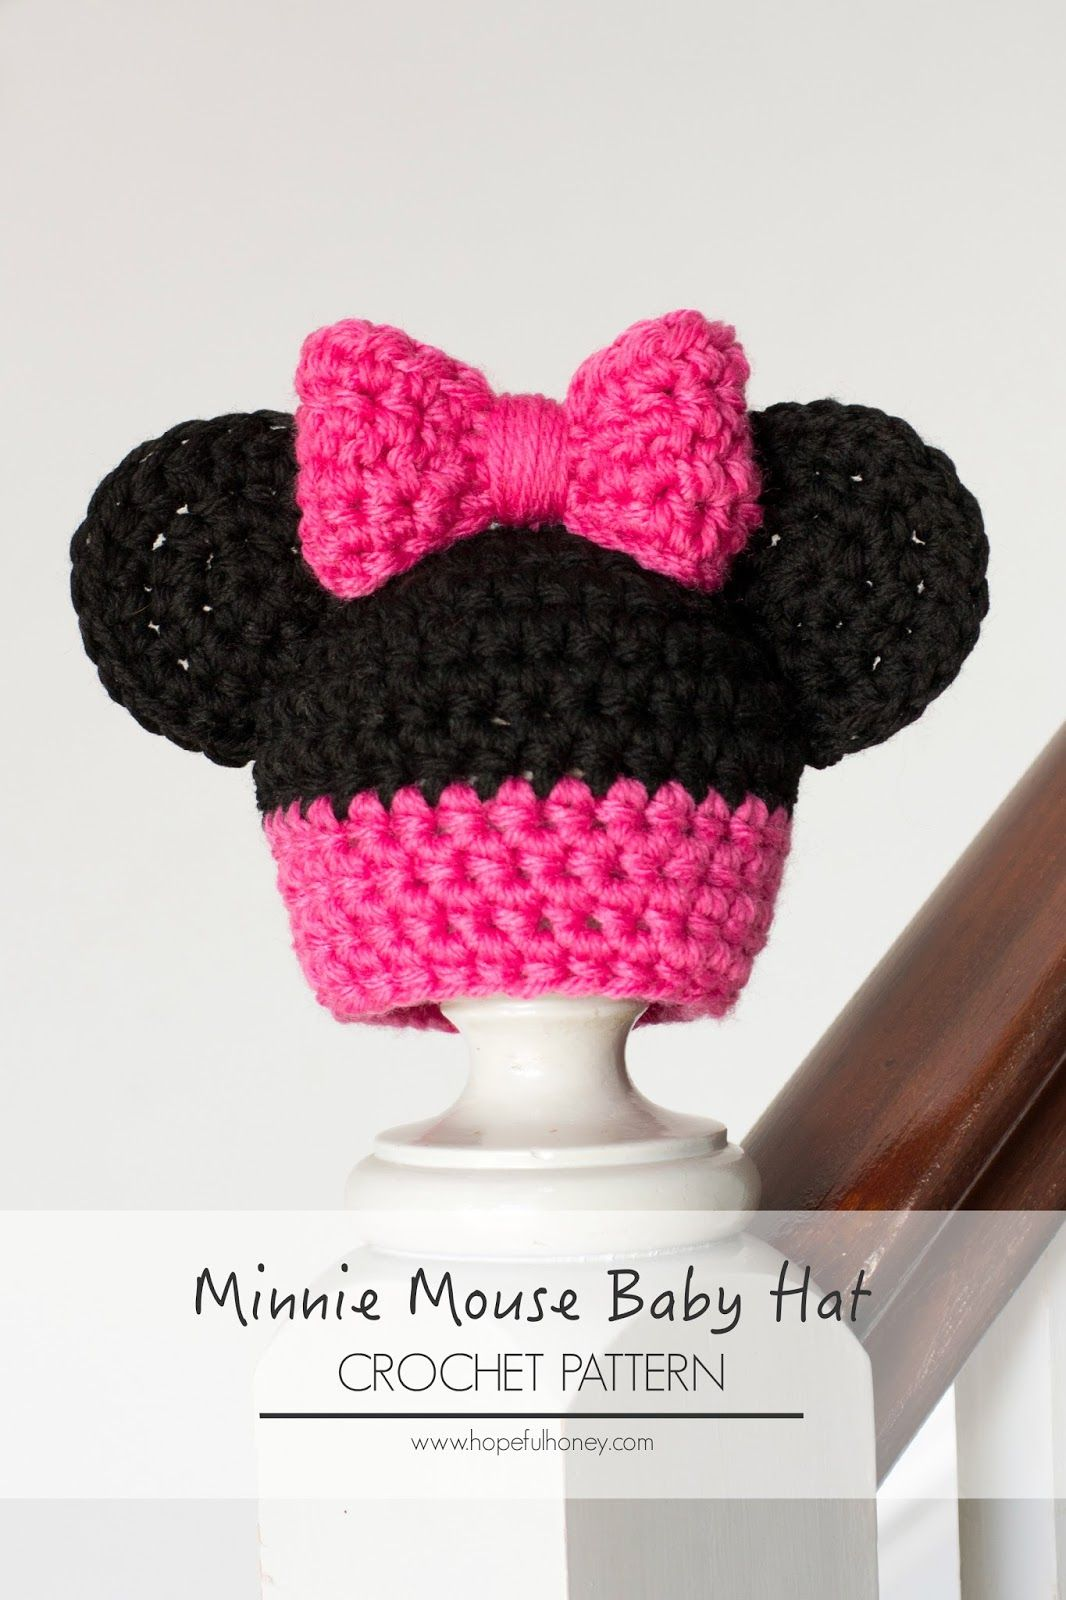 Minnie Mouse Crochet Pattern Free Interesting Decorating Ideas